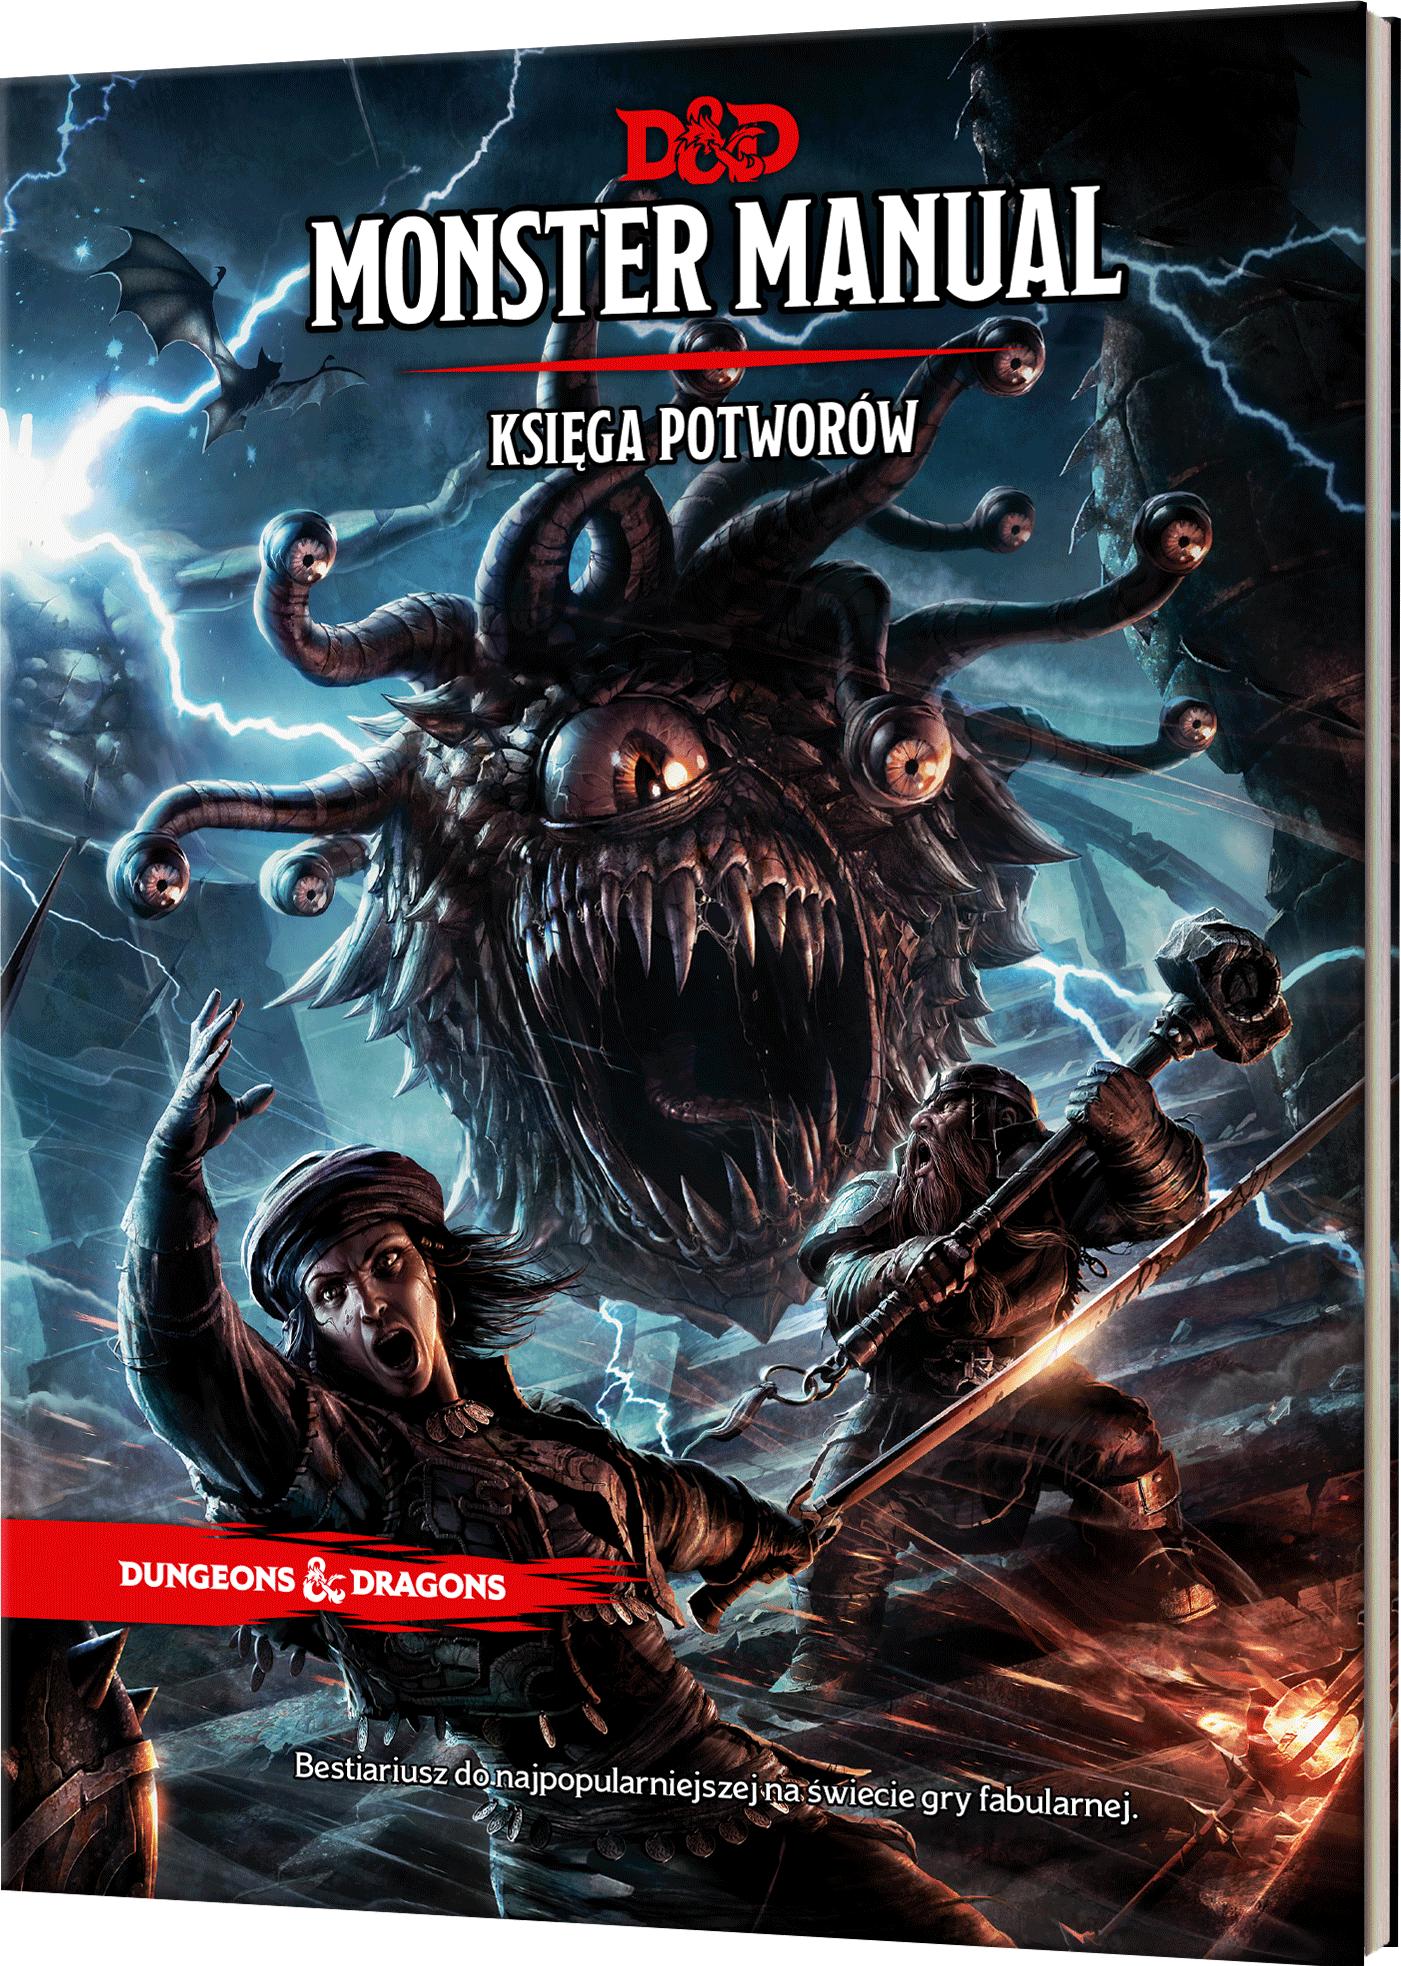 Dungeons & Dragons: Monster Manual (Księga Potworów) - 1